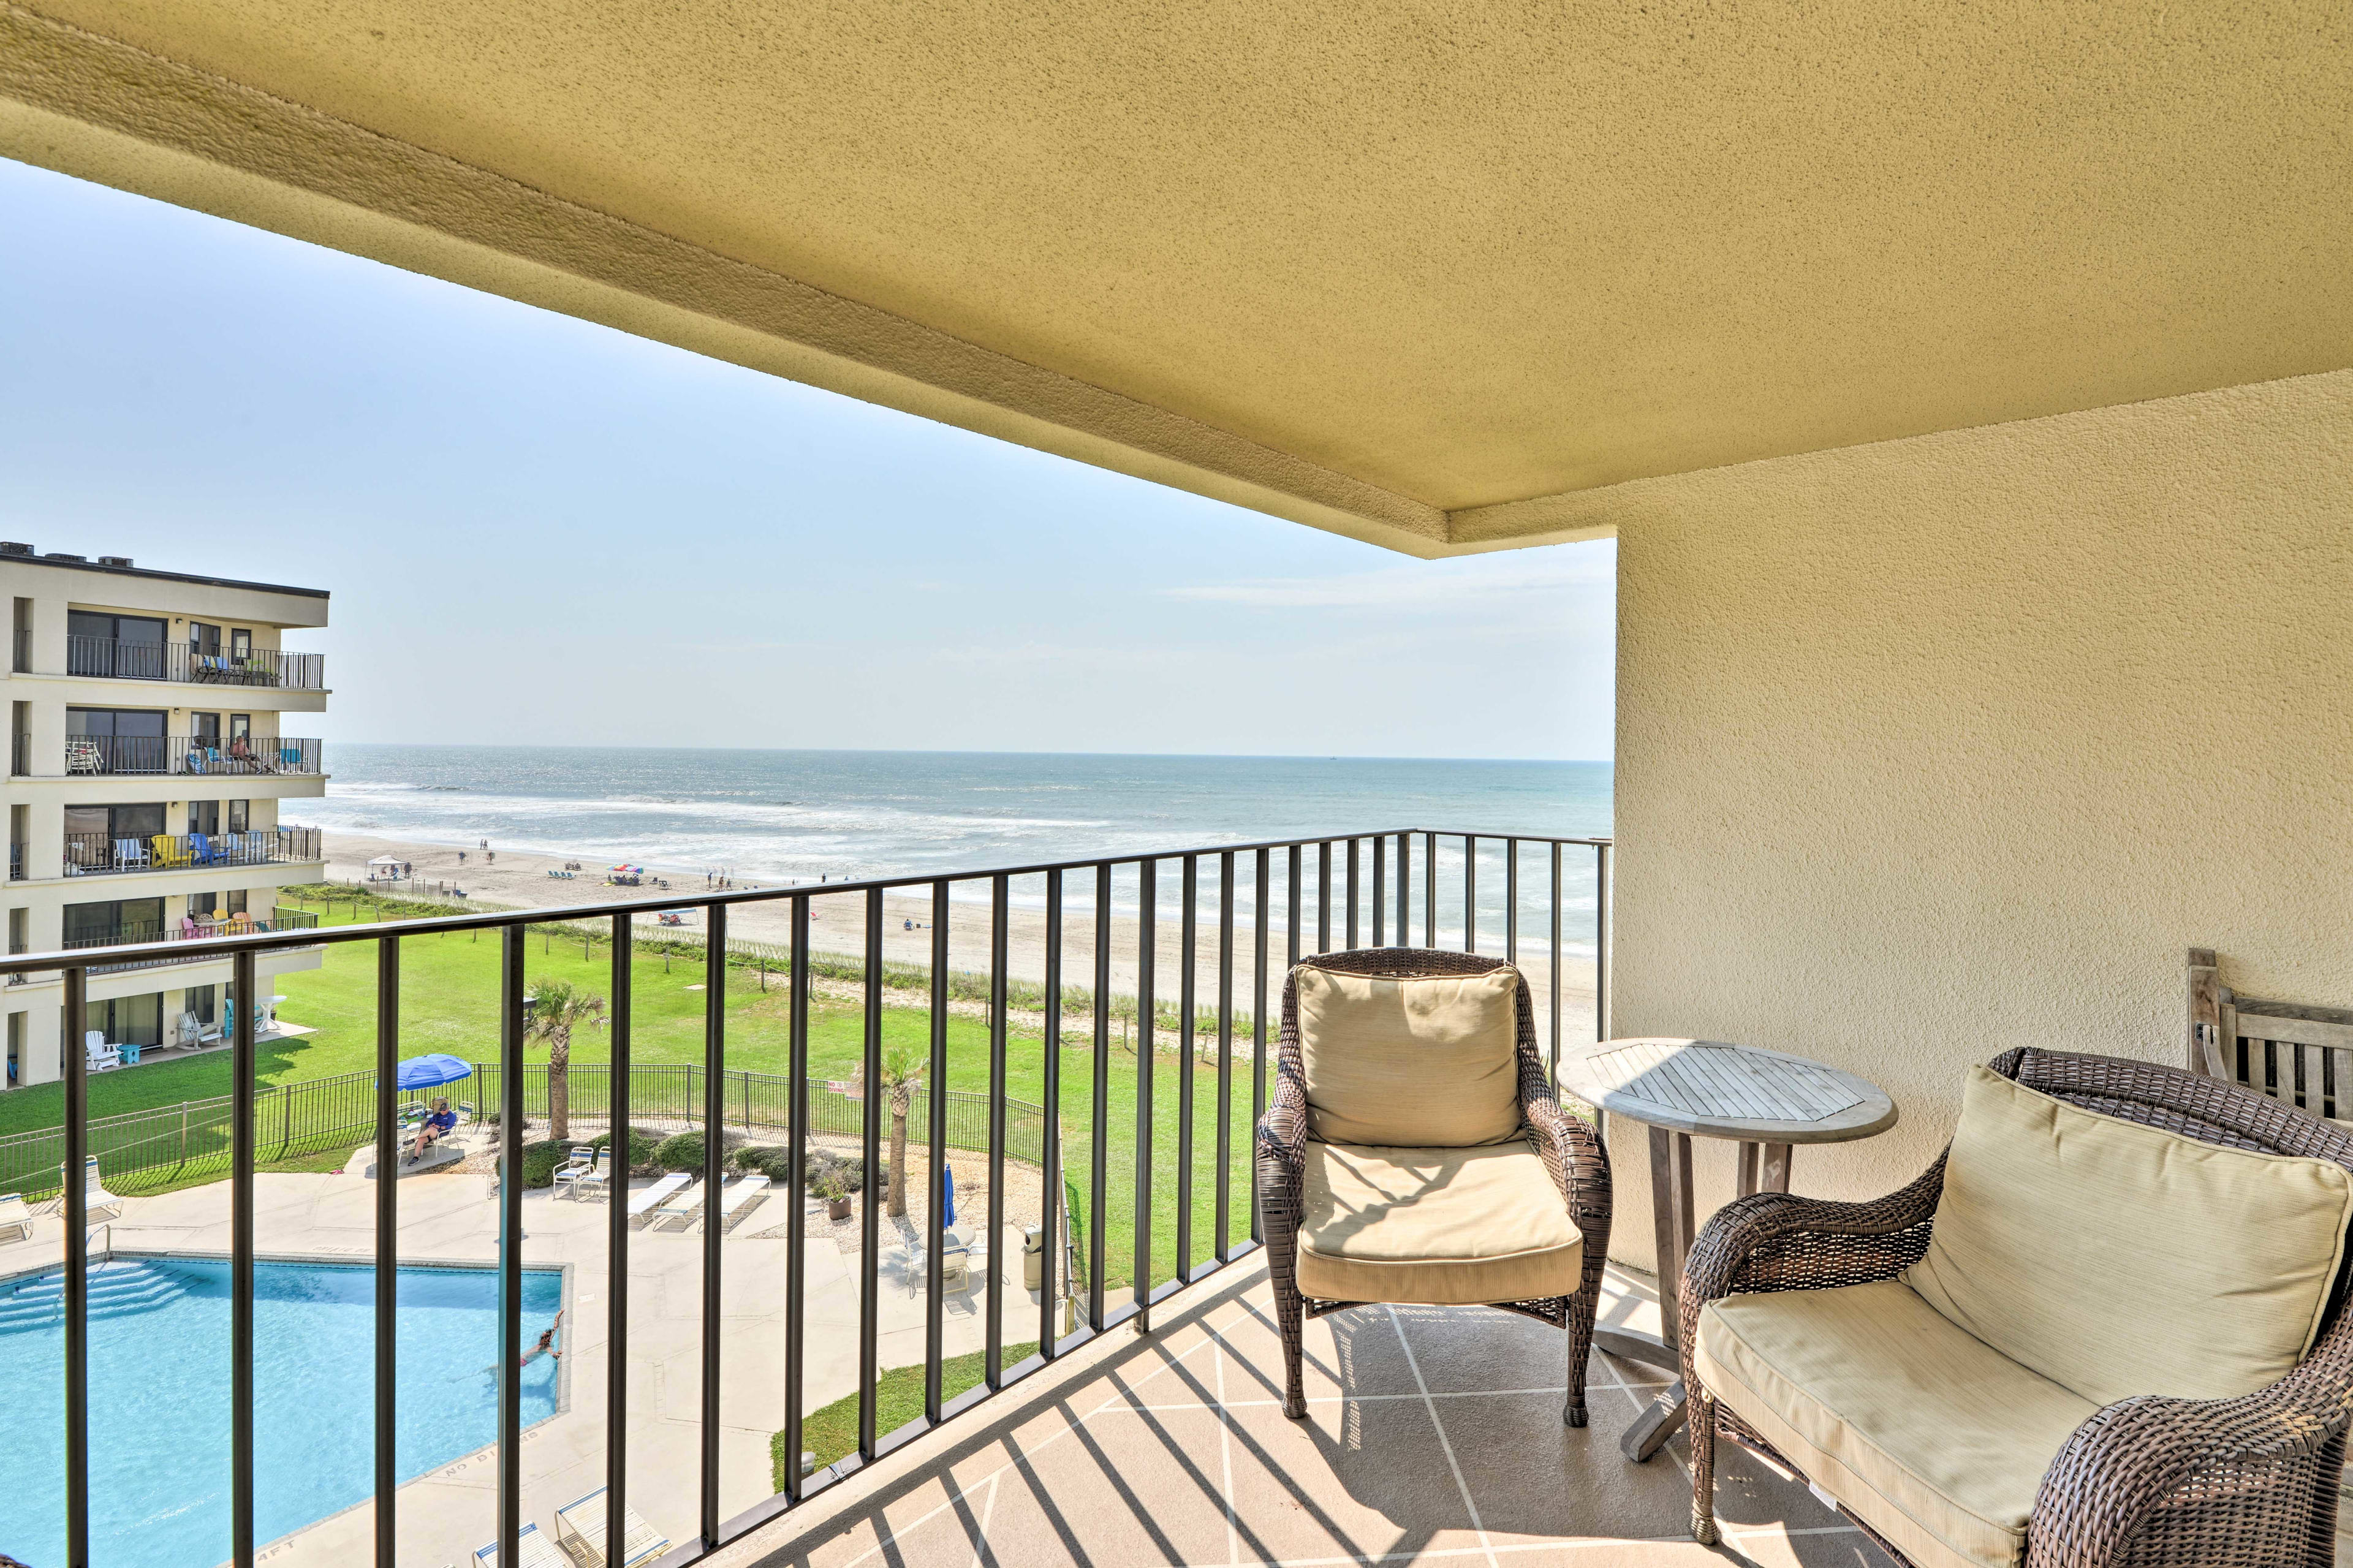 Book your Coastal North Carolina retreat to this spacious beach nook!